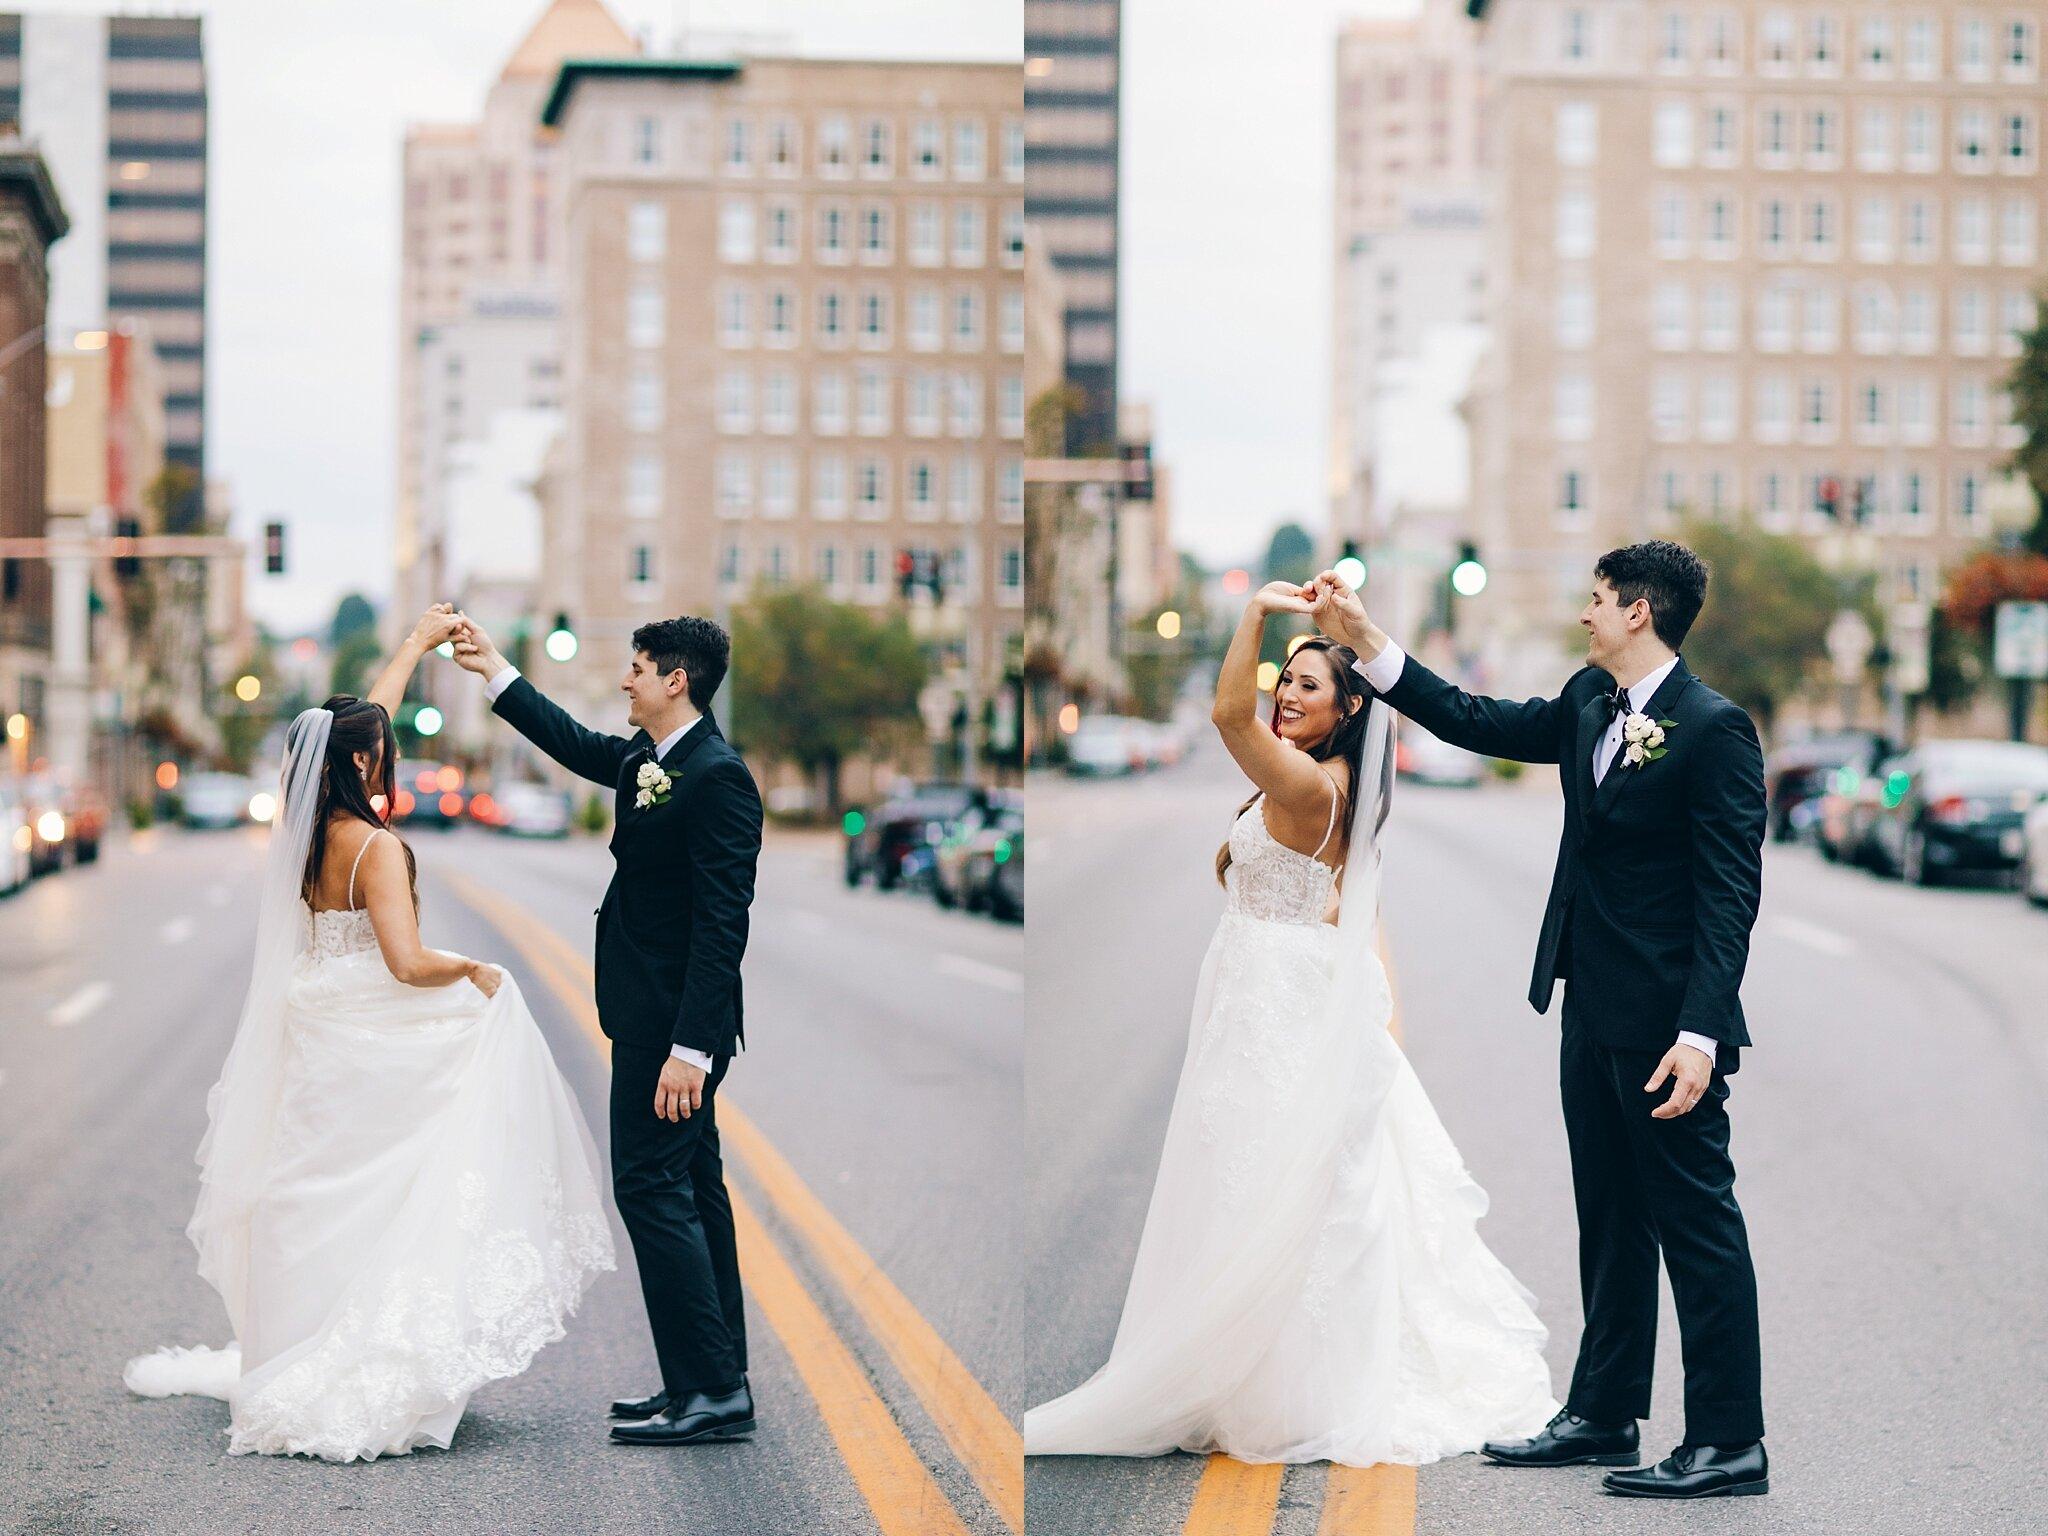 patrick-henry-ballroom-wedding-roanoke_0518.jpg